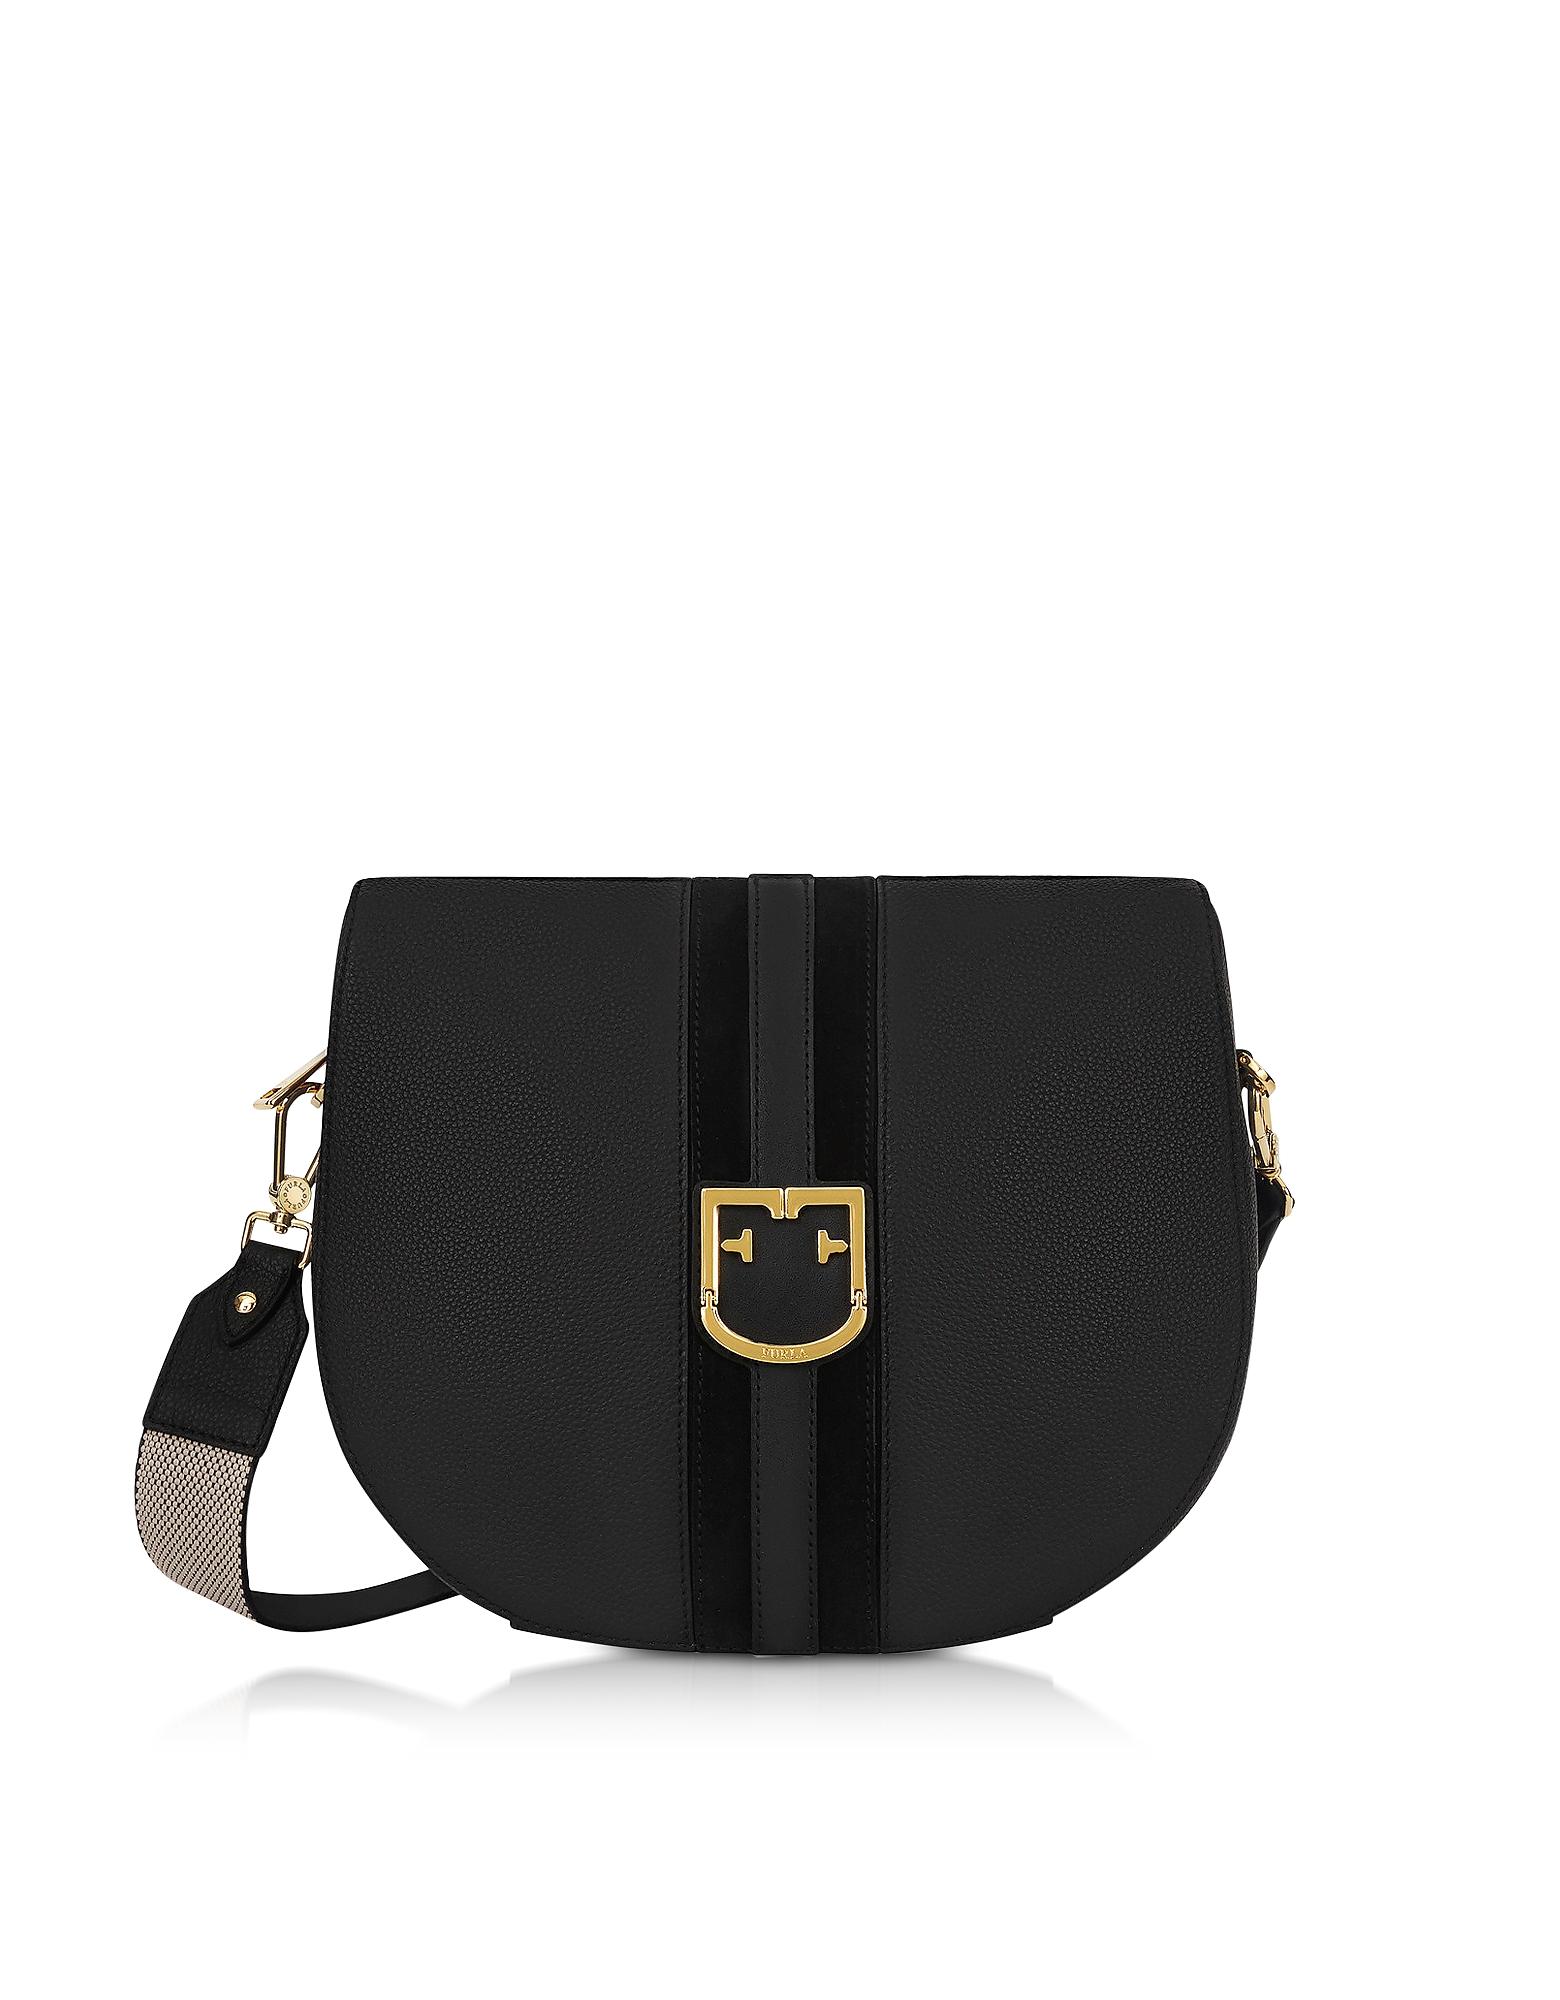 Gioia Small Crossbody Bag